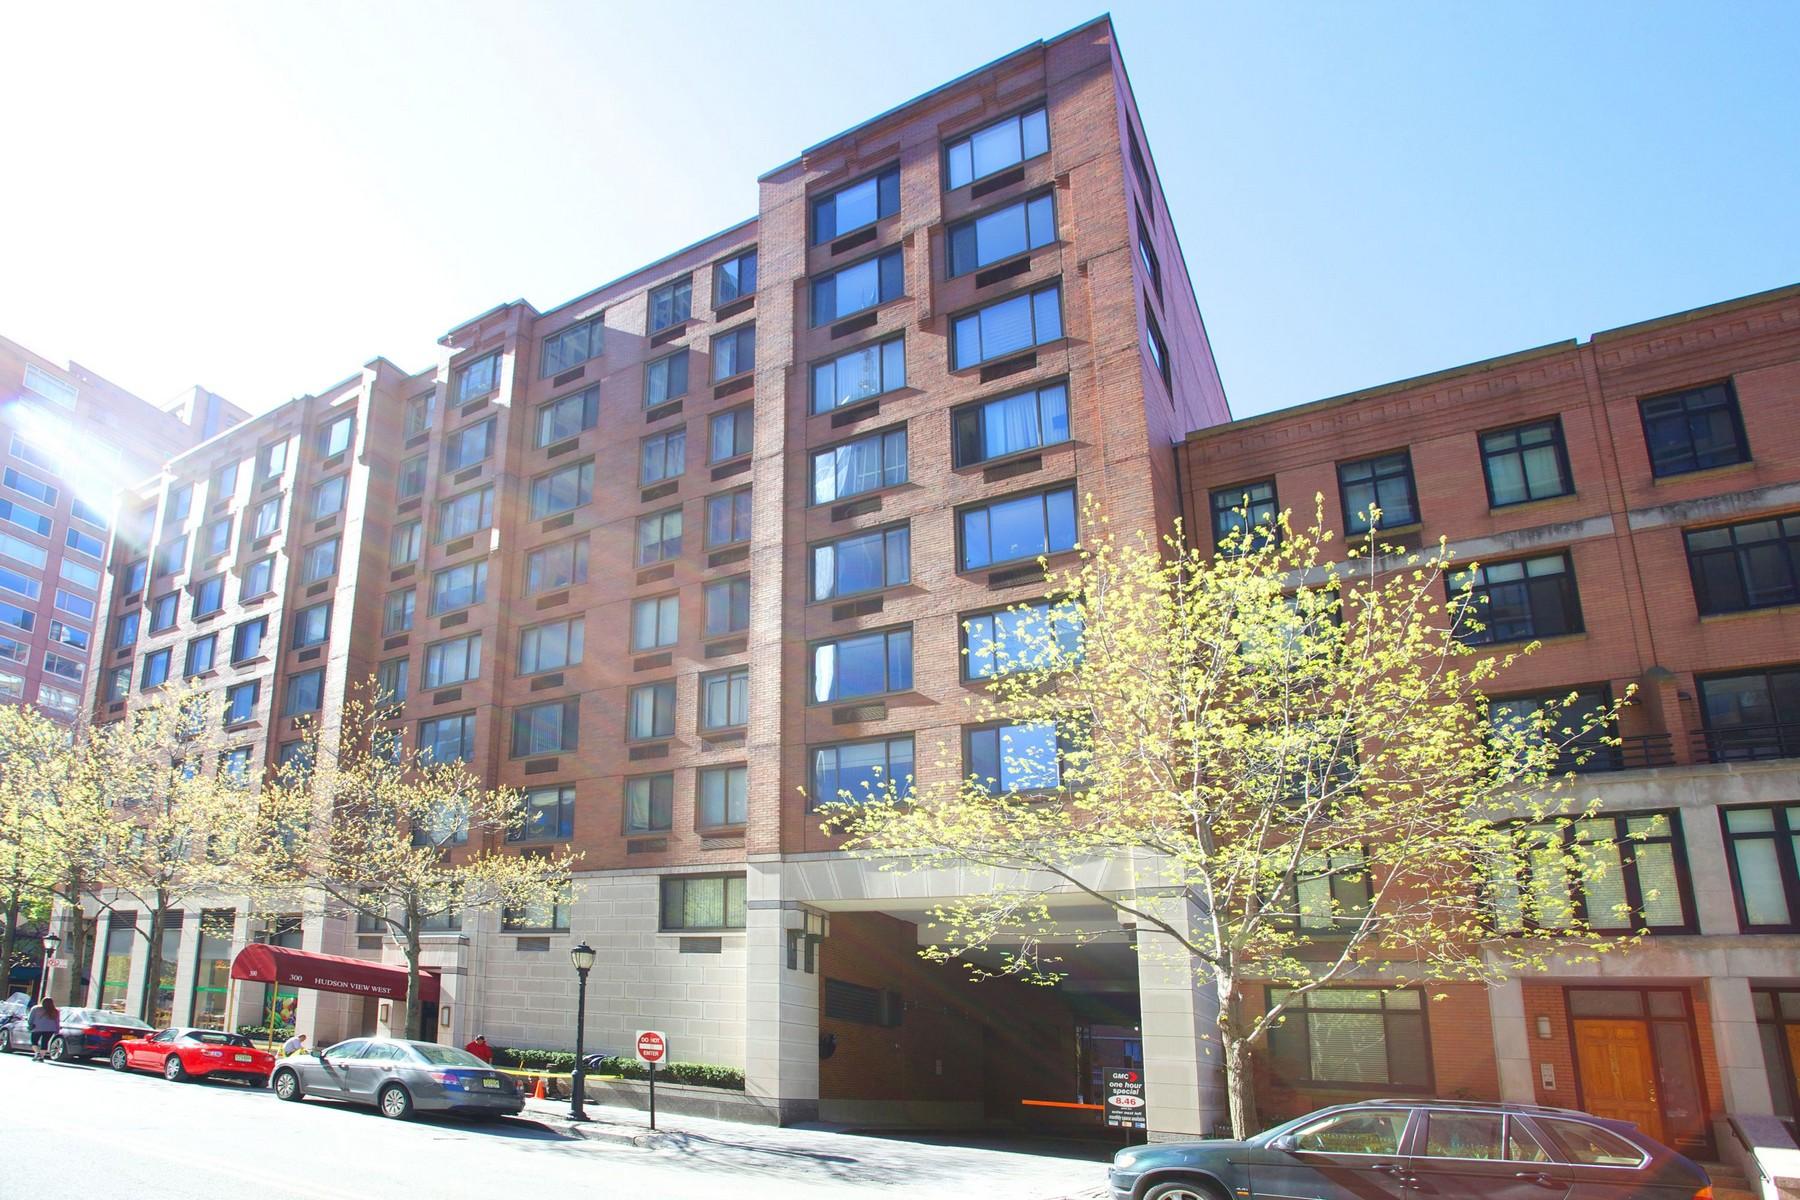 Кооперативная квартира для того Продажа на Spacious Studio in all brick highrise 300 Albany Street #5-O Hudson View West New York, Нью-Йорк 10280 Соединенные Штаты